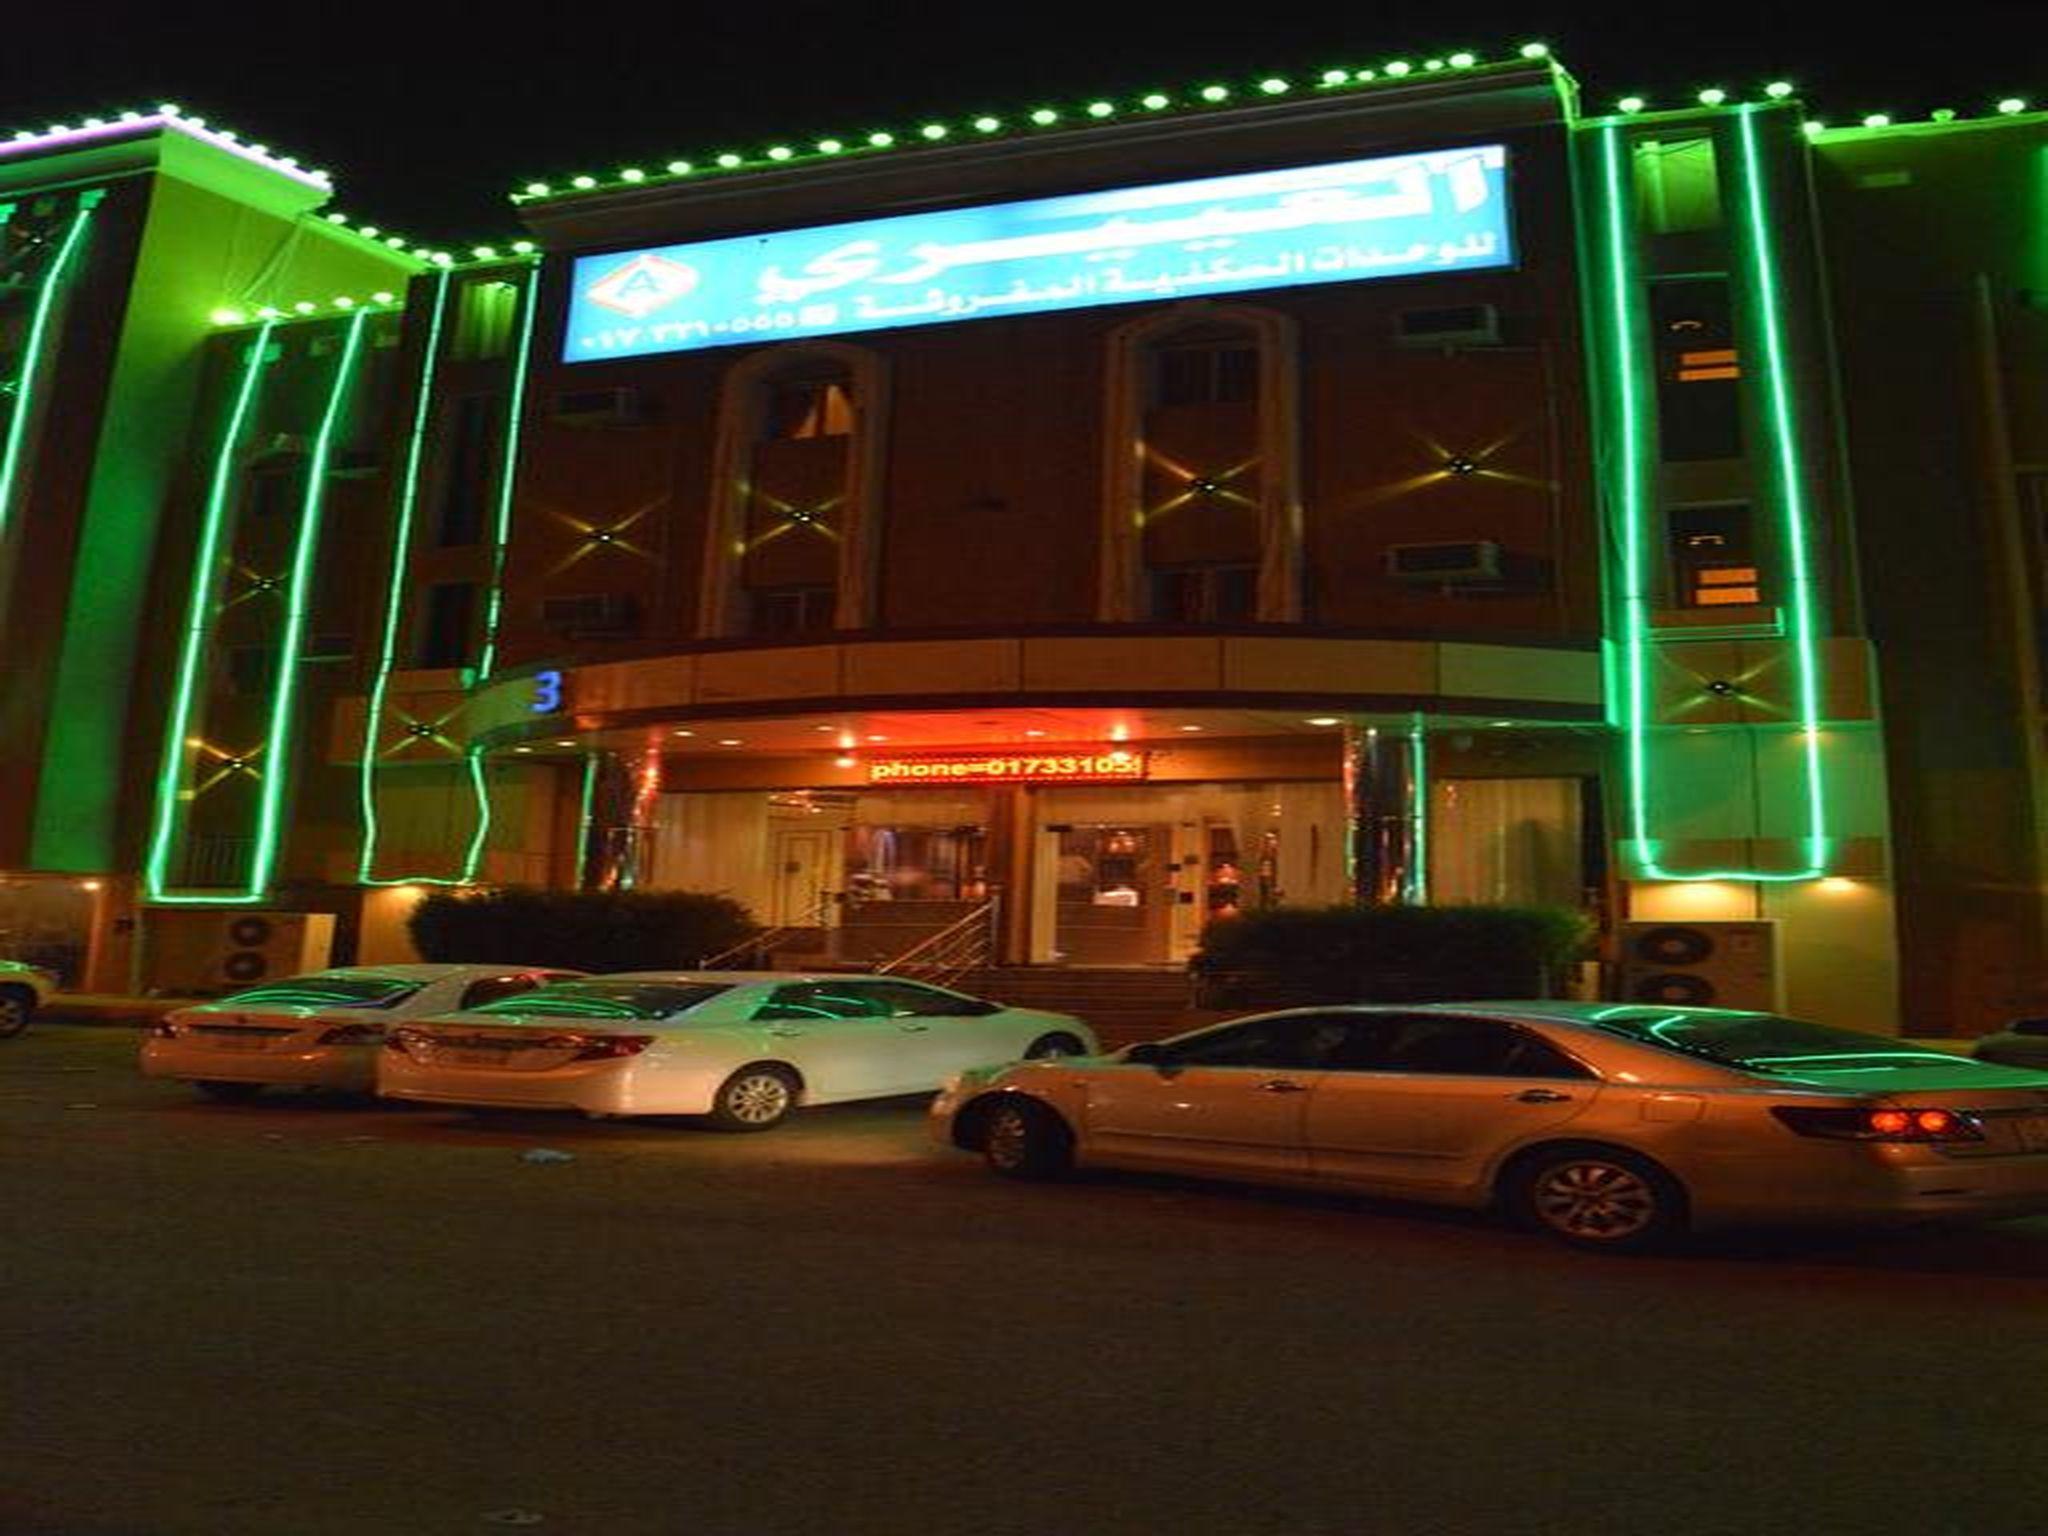 Al Eairy Apartments Jazan 3,